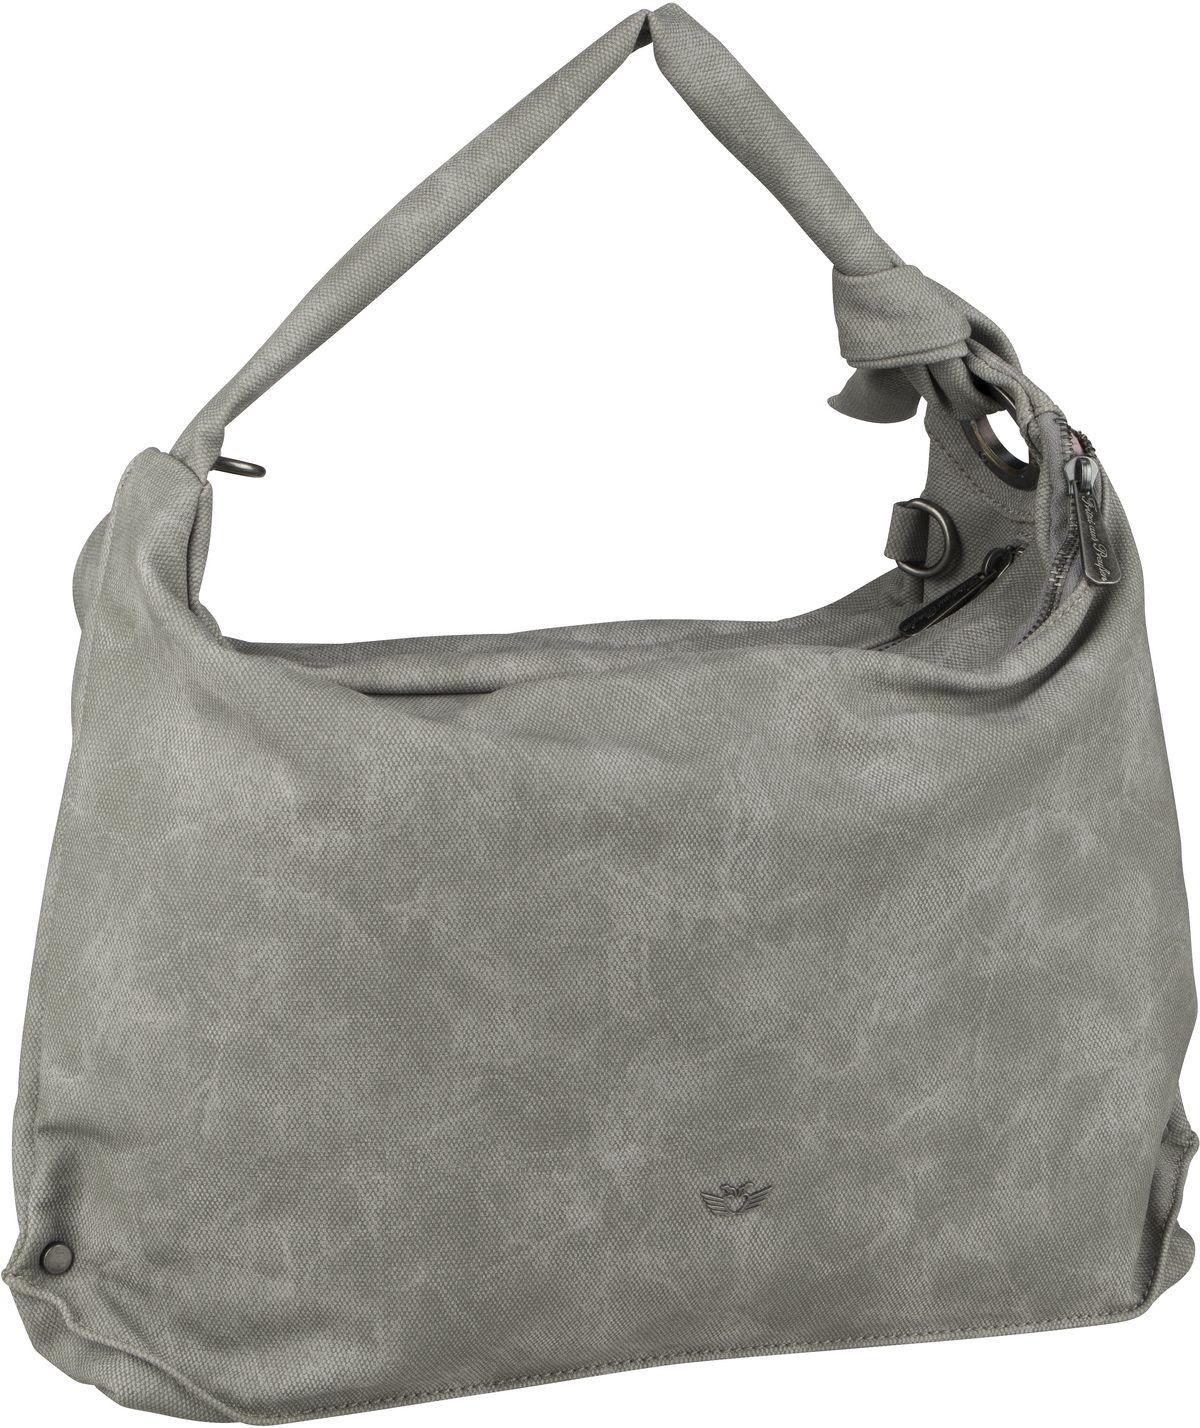 Handtasche Bina Kelim Stone